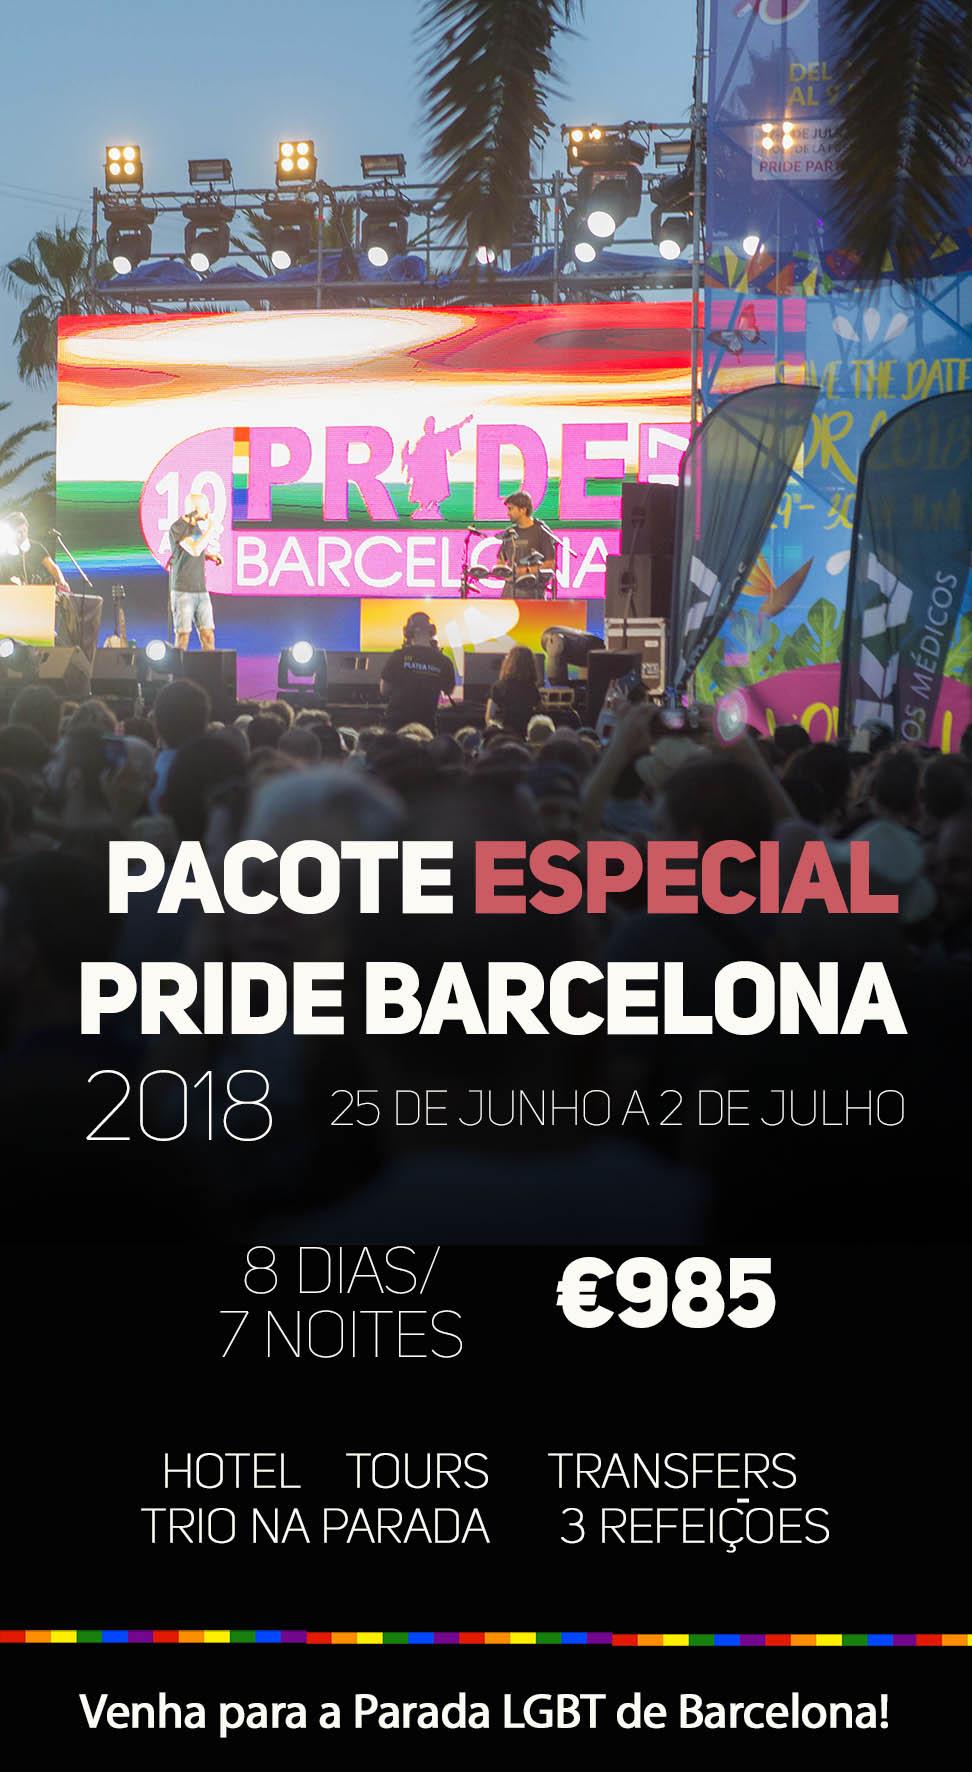 LGBT-Pacote-Barcelona-Pride-pinterest